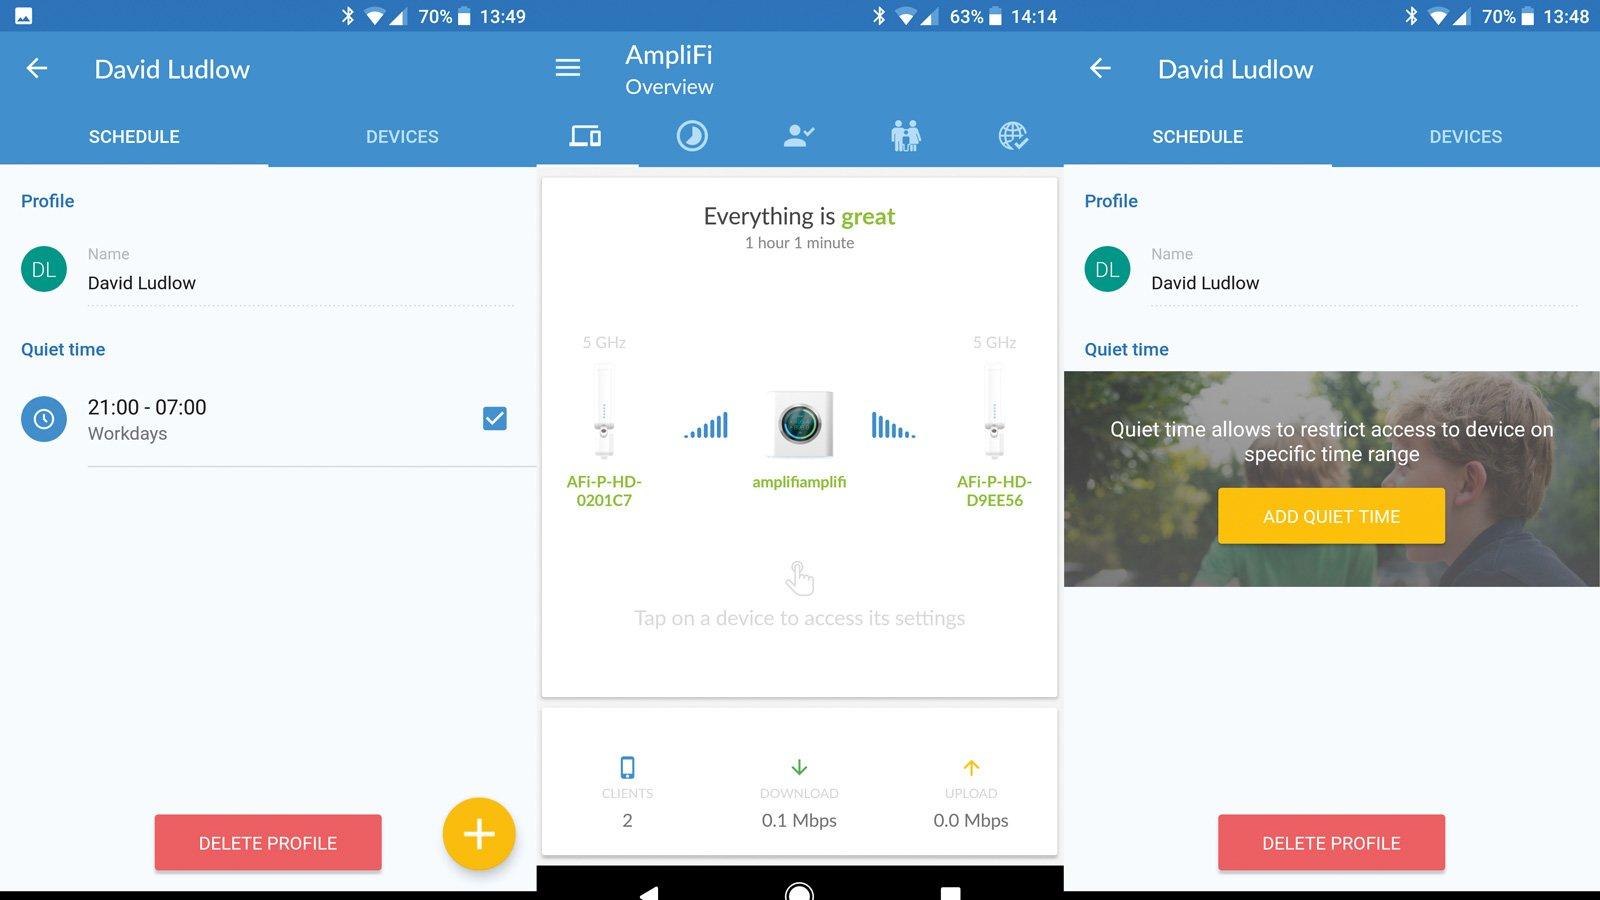 Ubiquiti AmpliFi HD review: A fine-looking mesh router | Expert Reviews